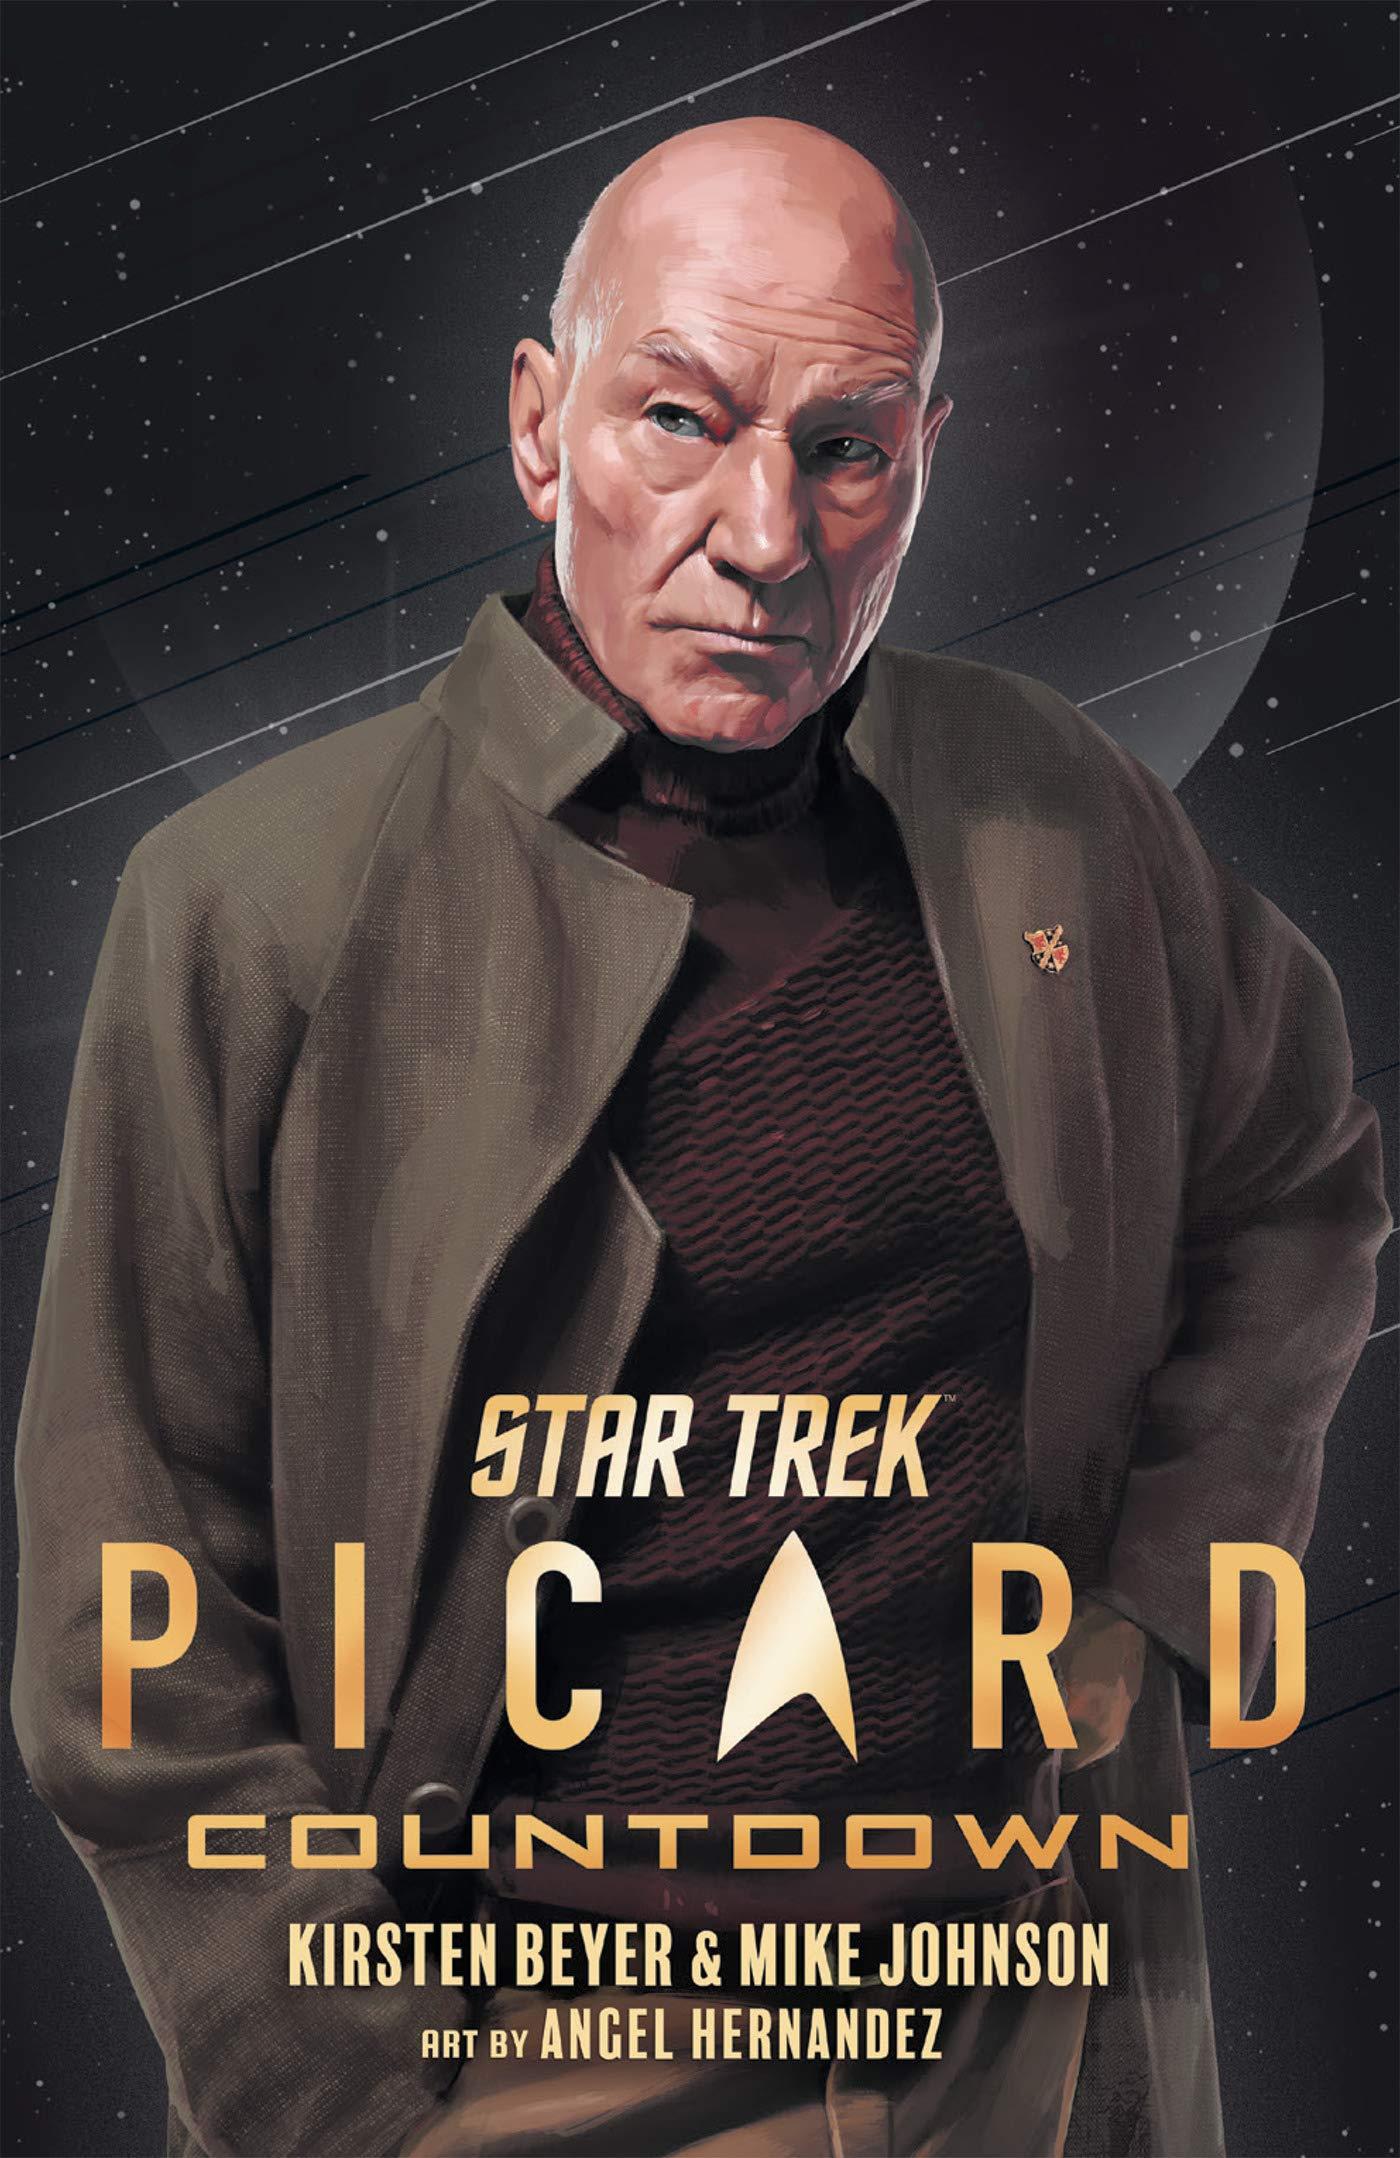 Star Trek: Picard - Countdown (omnibus)